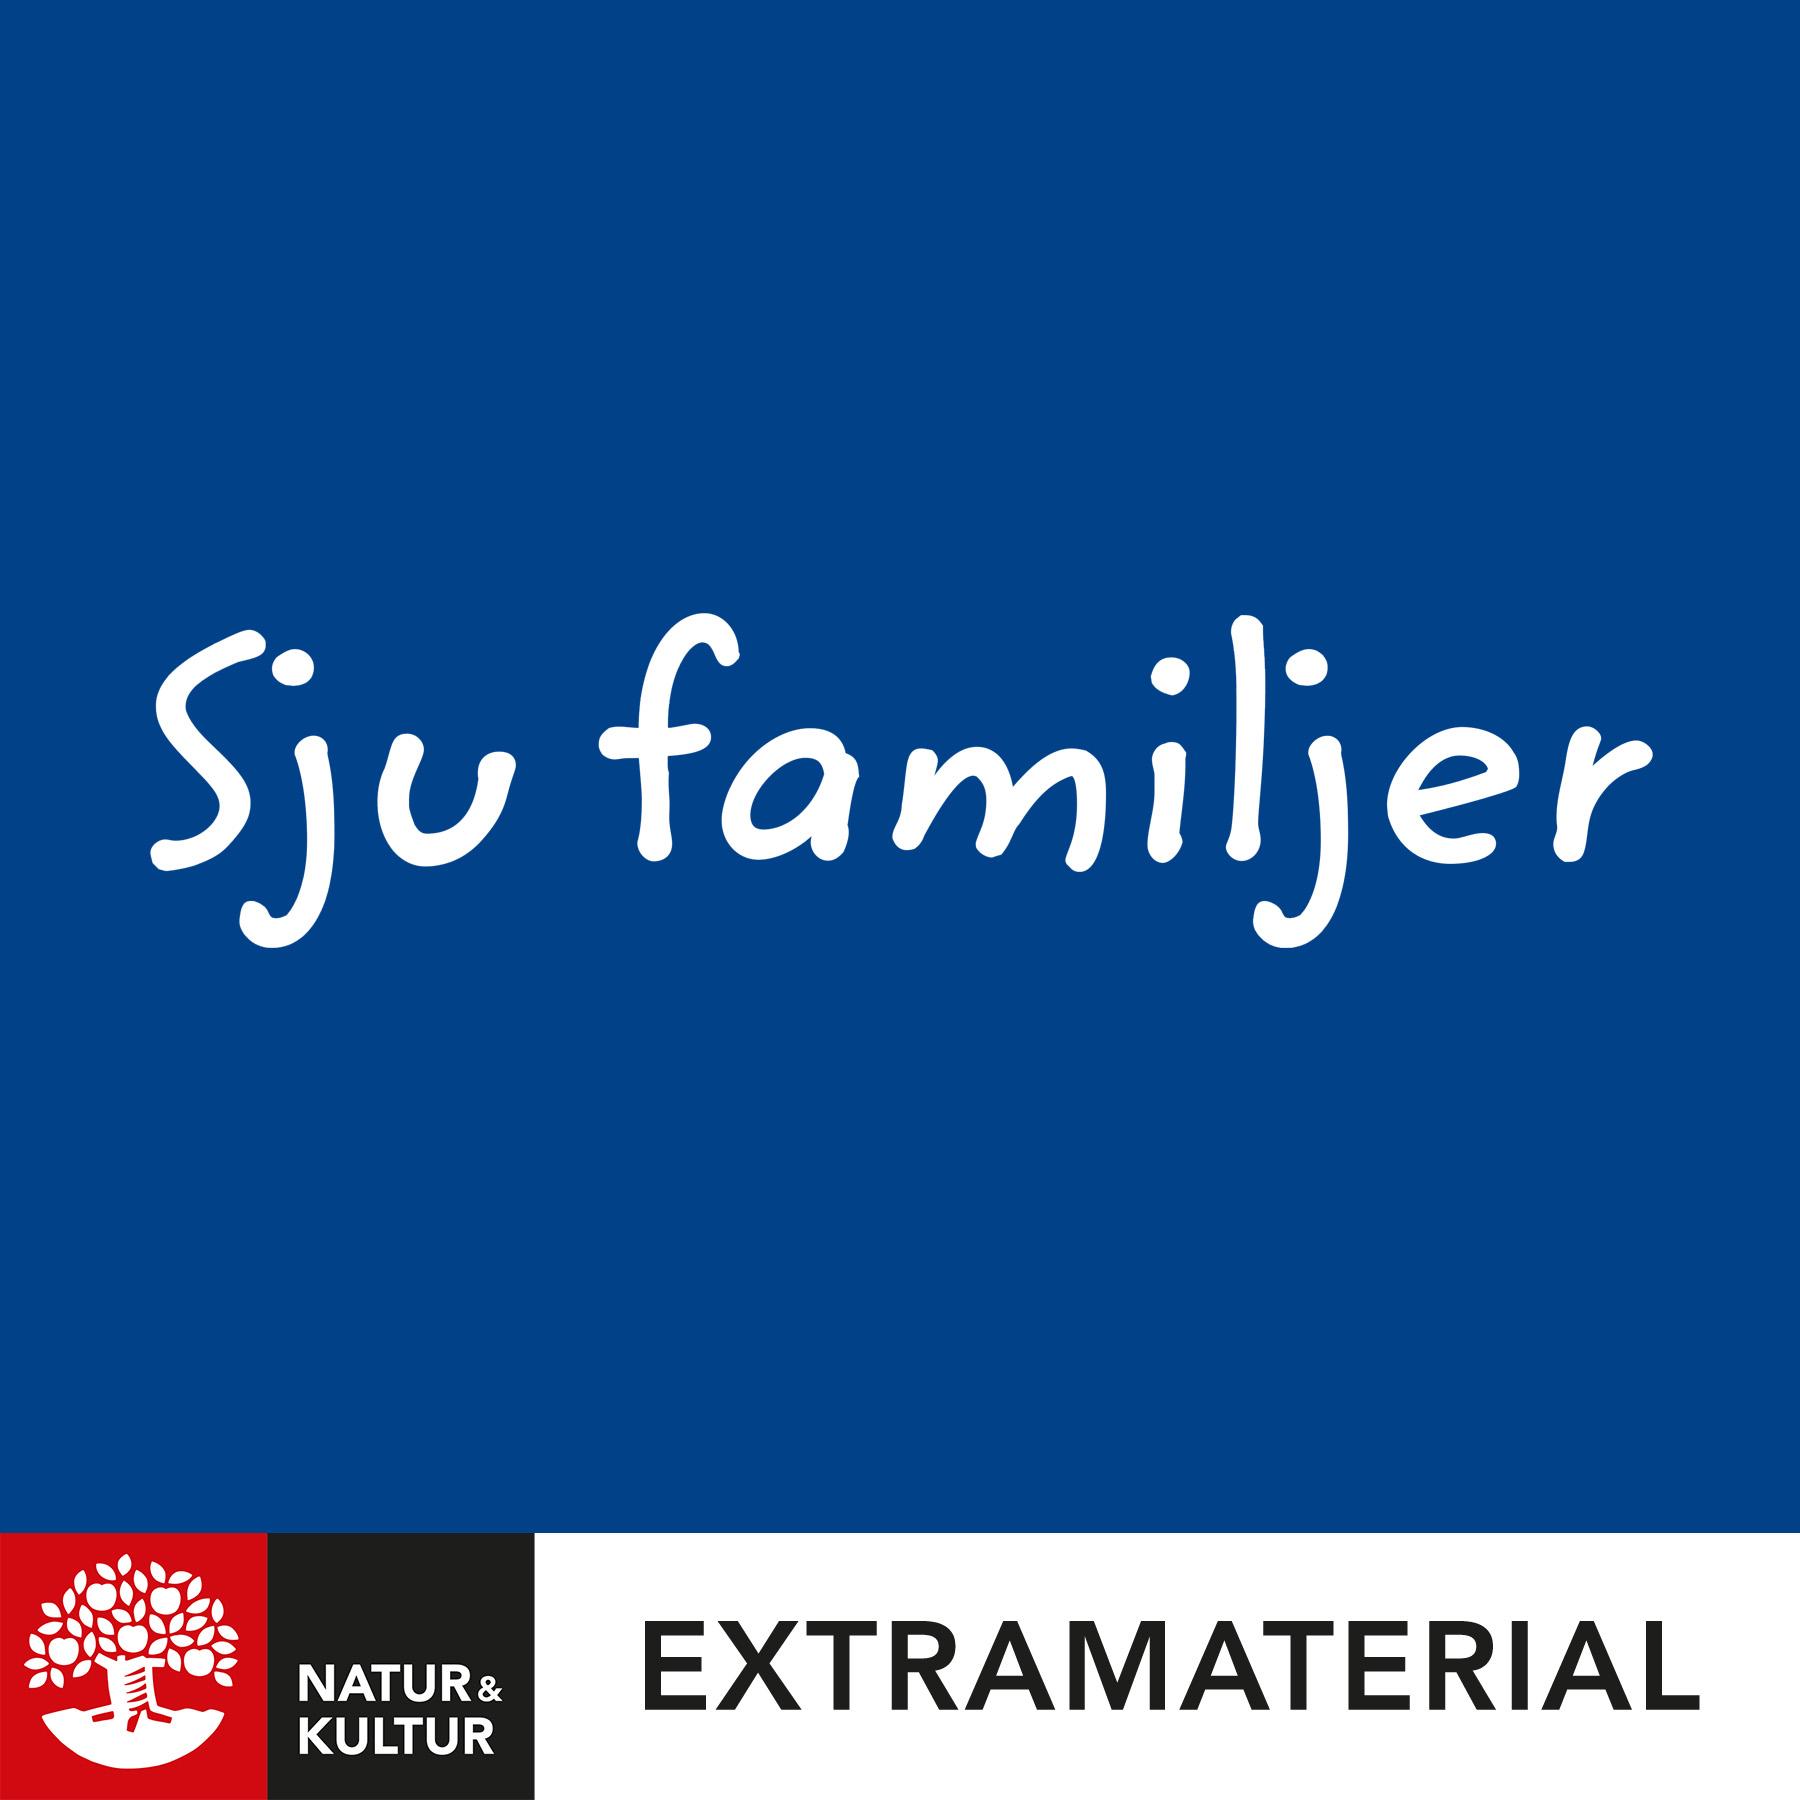 Sju familjer